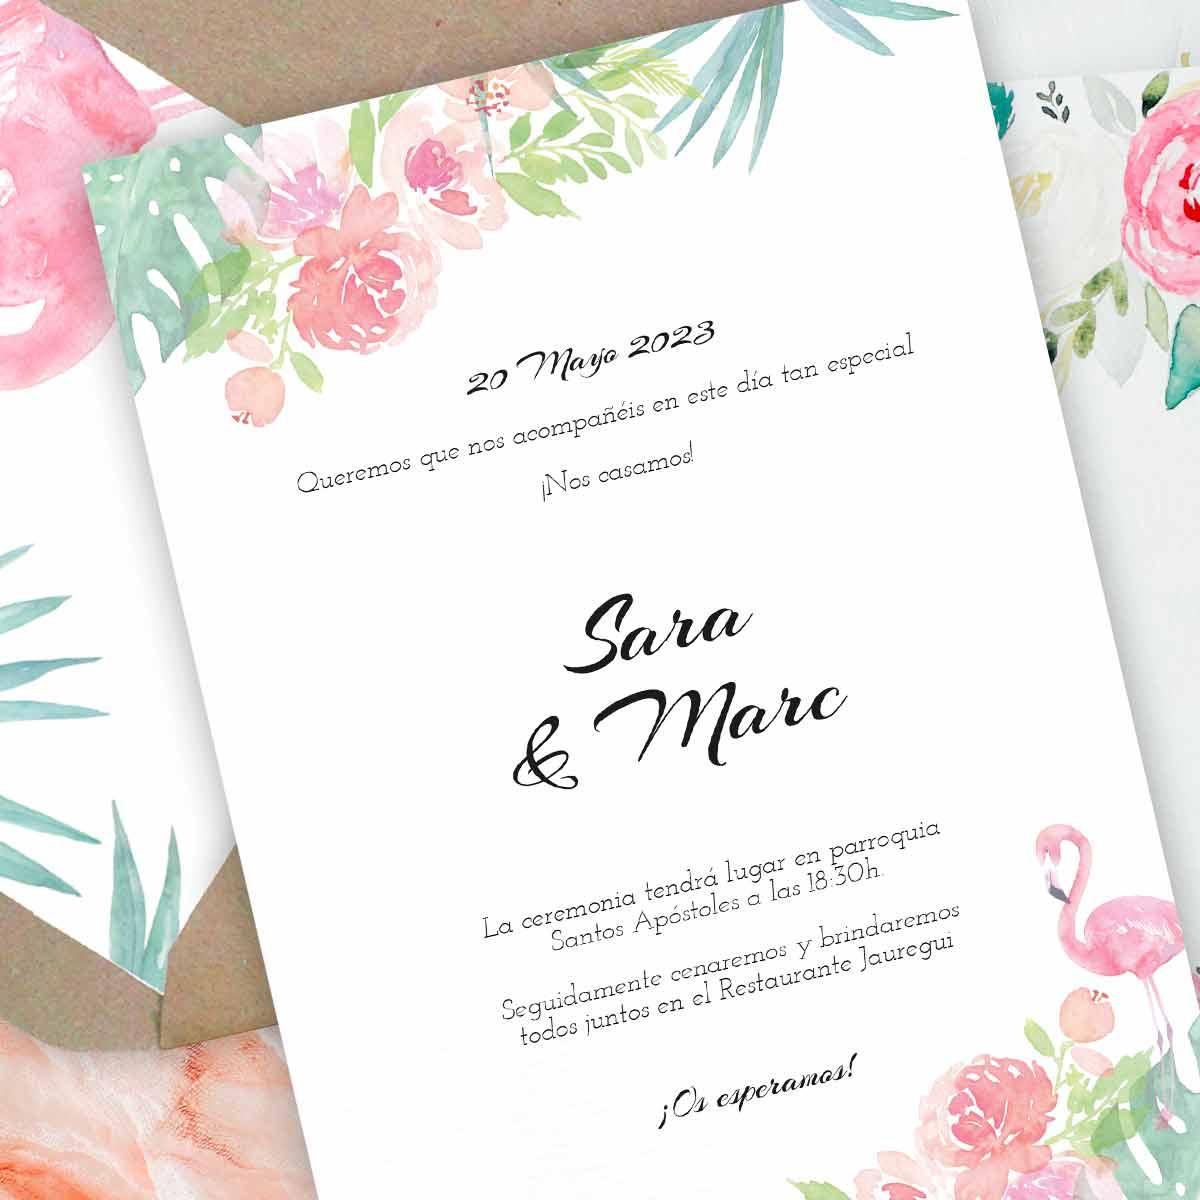 Invitación de boda Tropical Chic